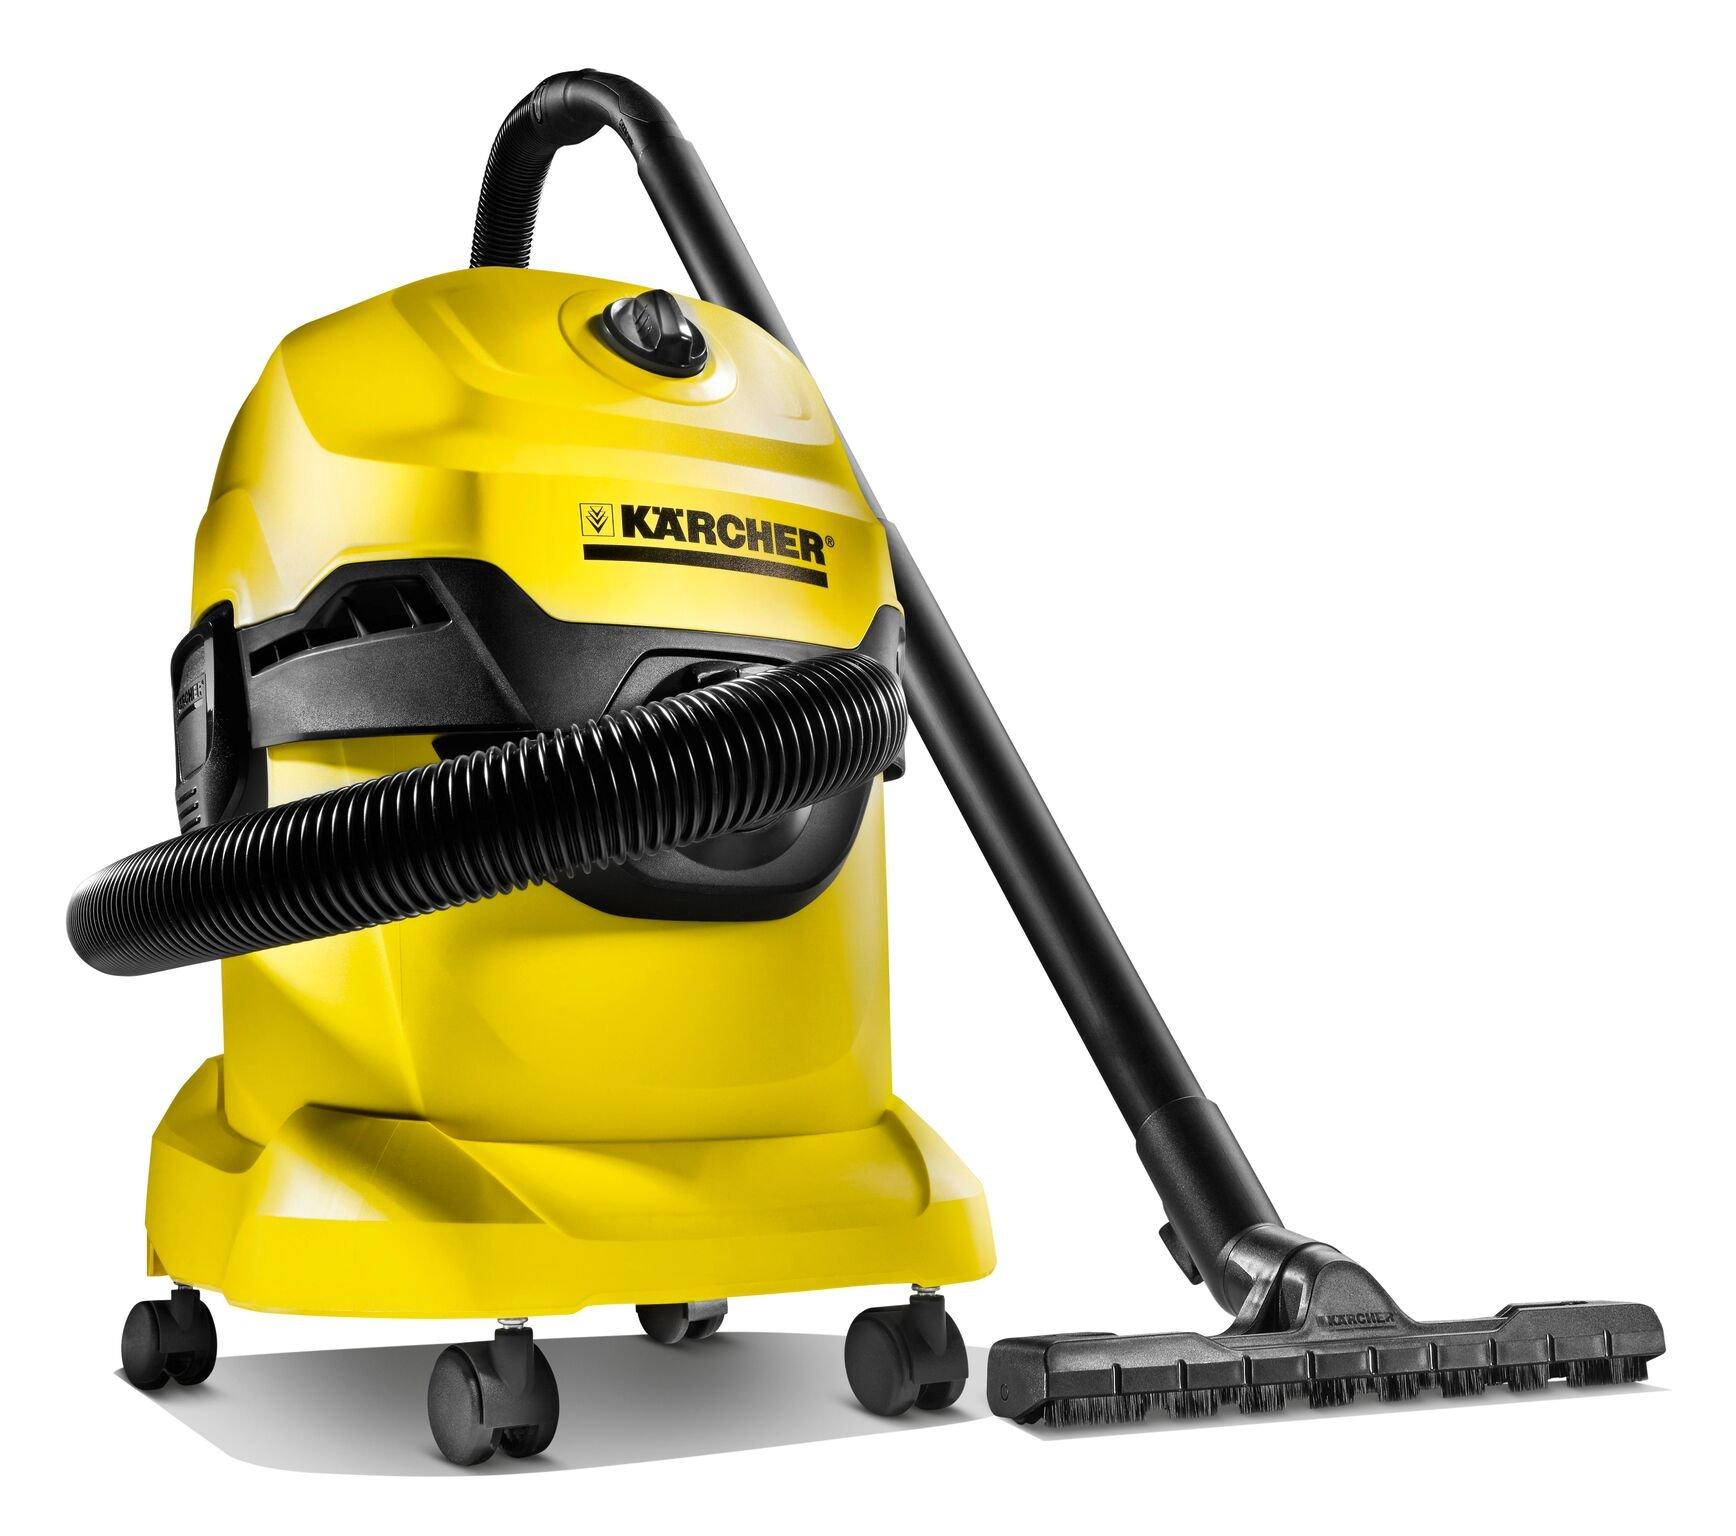 Kärcher WD 4 Aspiradora , 20L, 1000 W, Amarillo: Amazon.es: Hogar